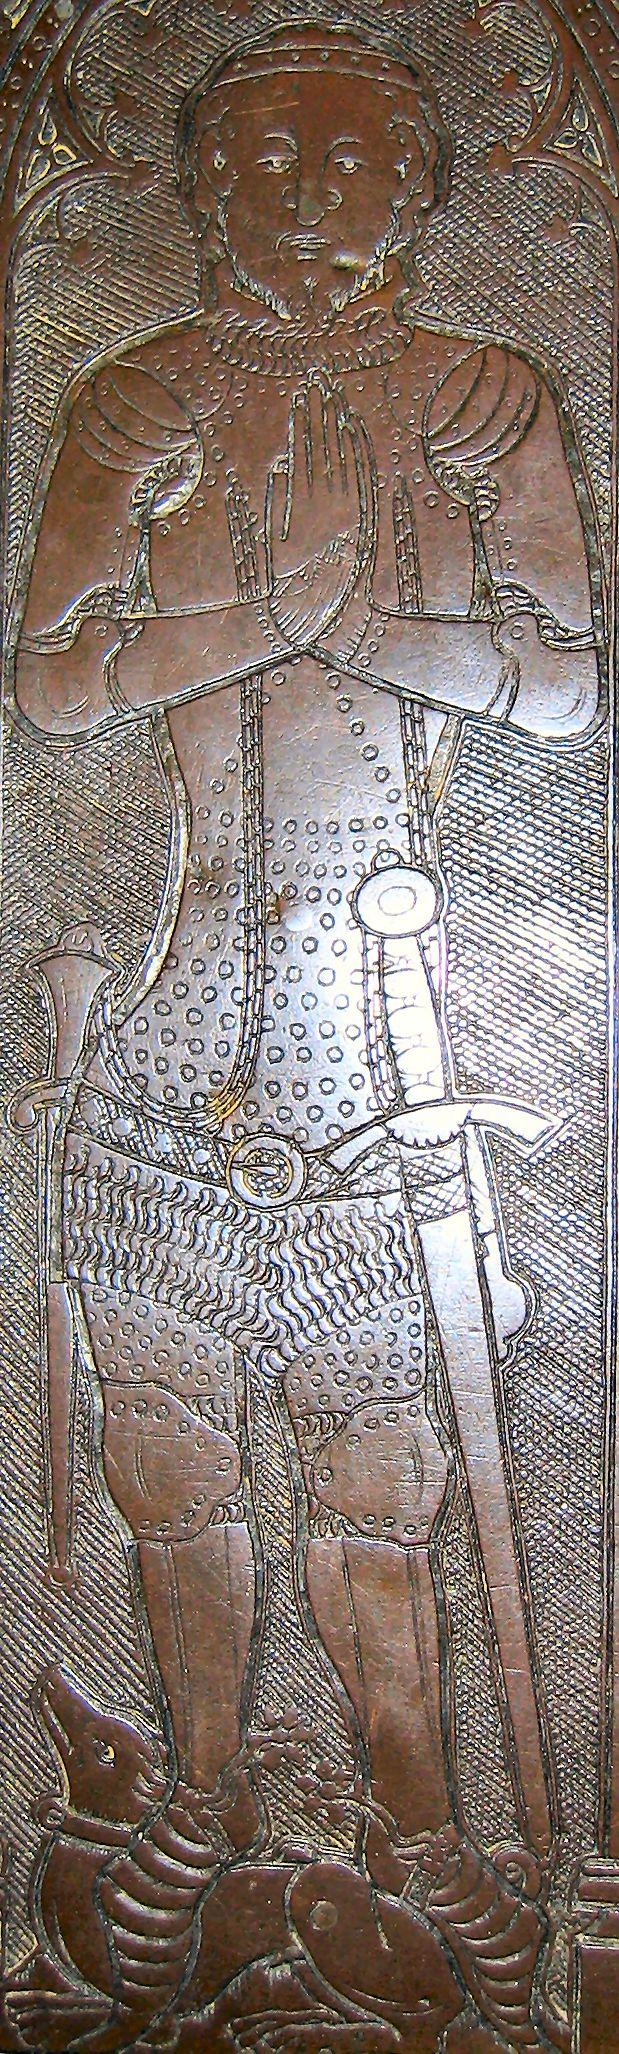 Ralph de Knevyton, died 1370  Aveley